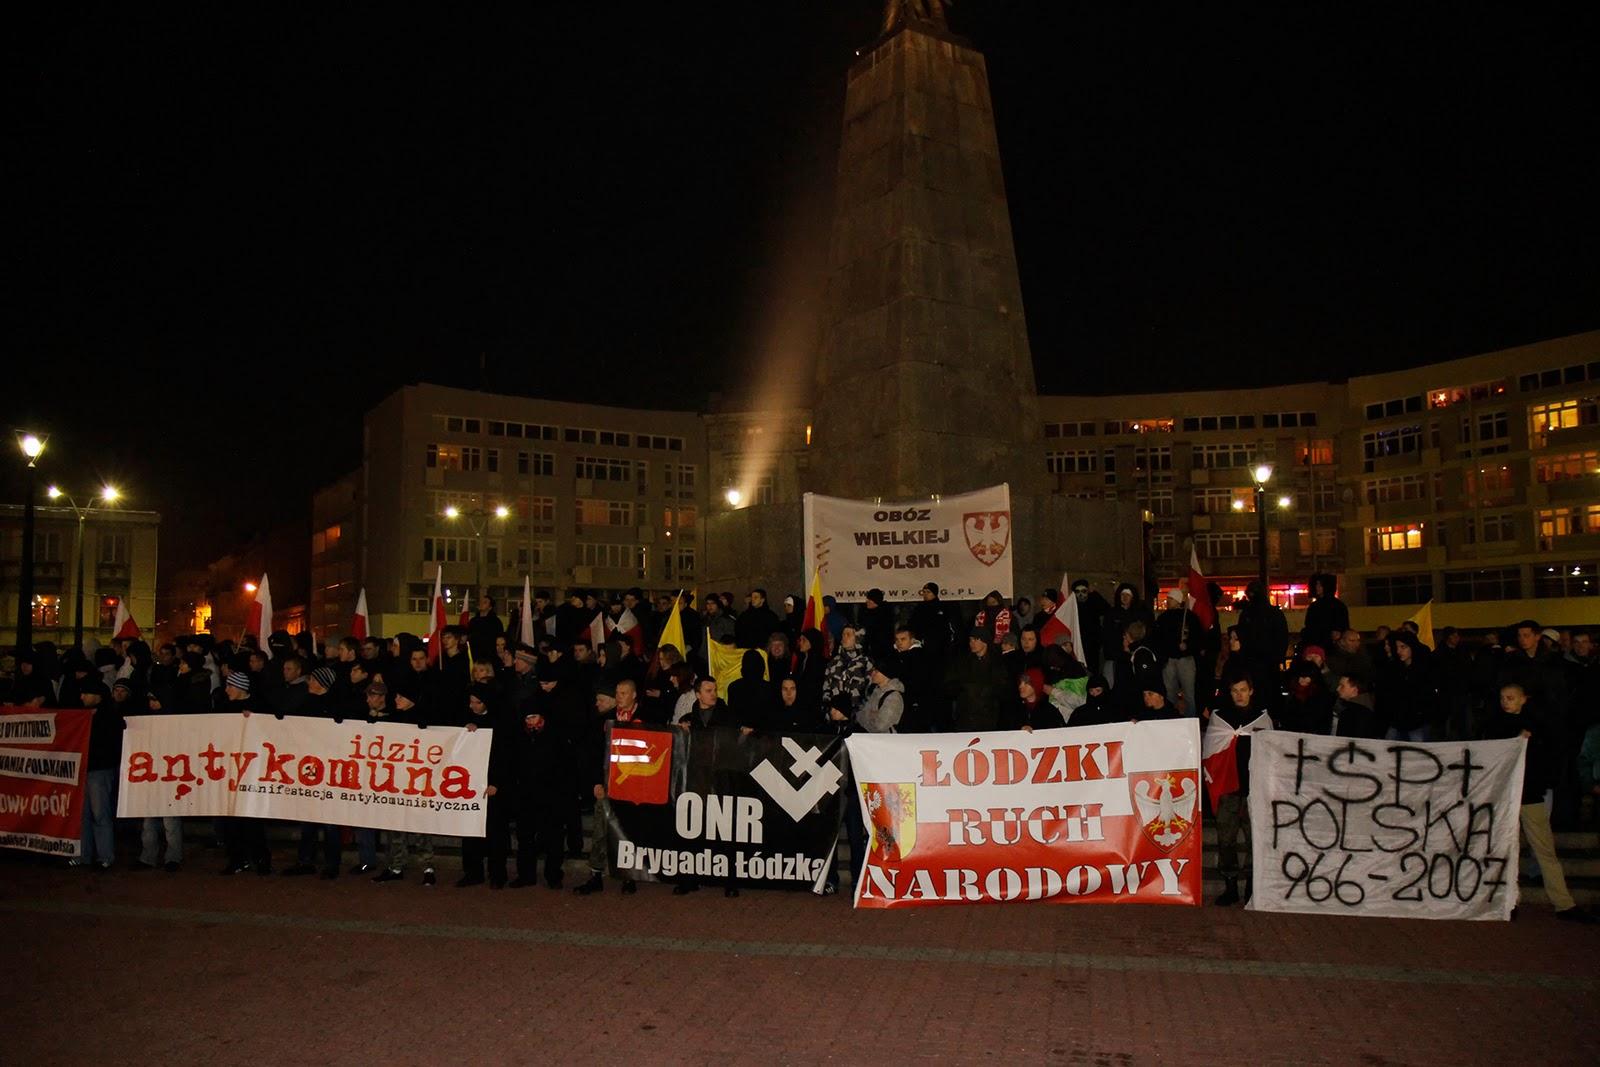 11.12.2011 Manifestacja Antykomunistyczna Łódź